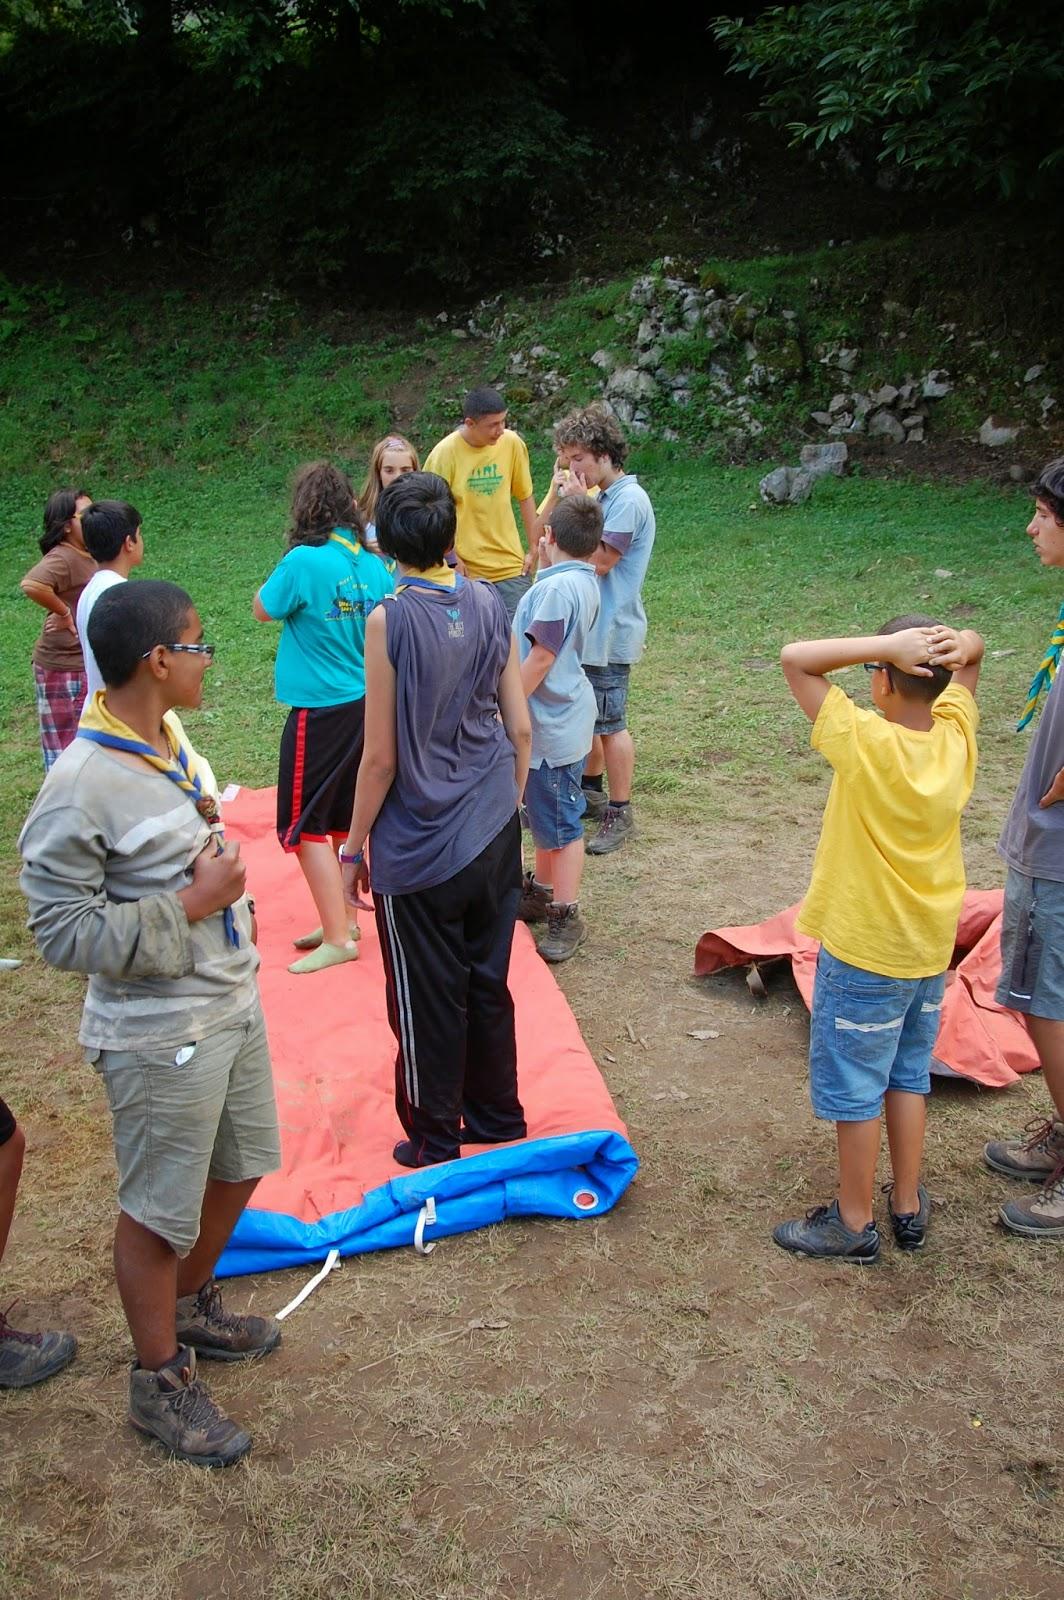 Campaments Estiu RolandKing 2011 - DSC_0350%2B2.jpg